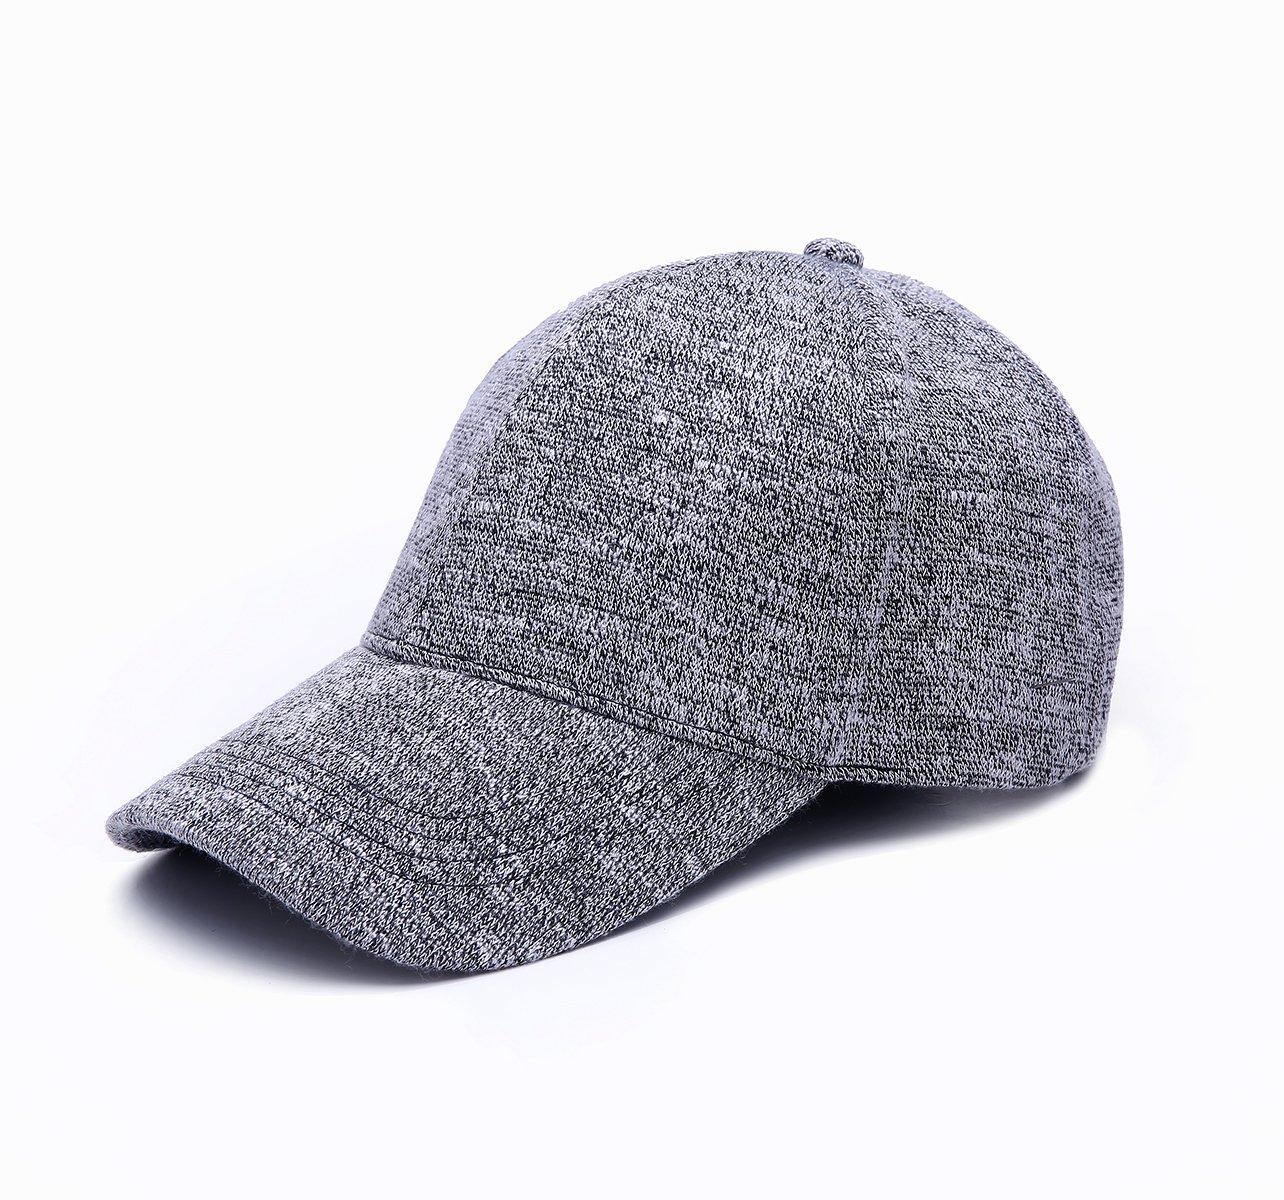 JOOWEN Unisex Knitted Textured Baseball Cap Soft Adjustable Solid Hat (Grey)